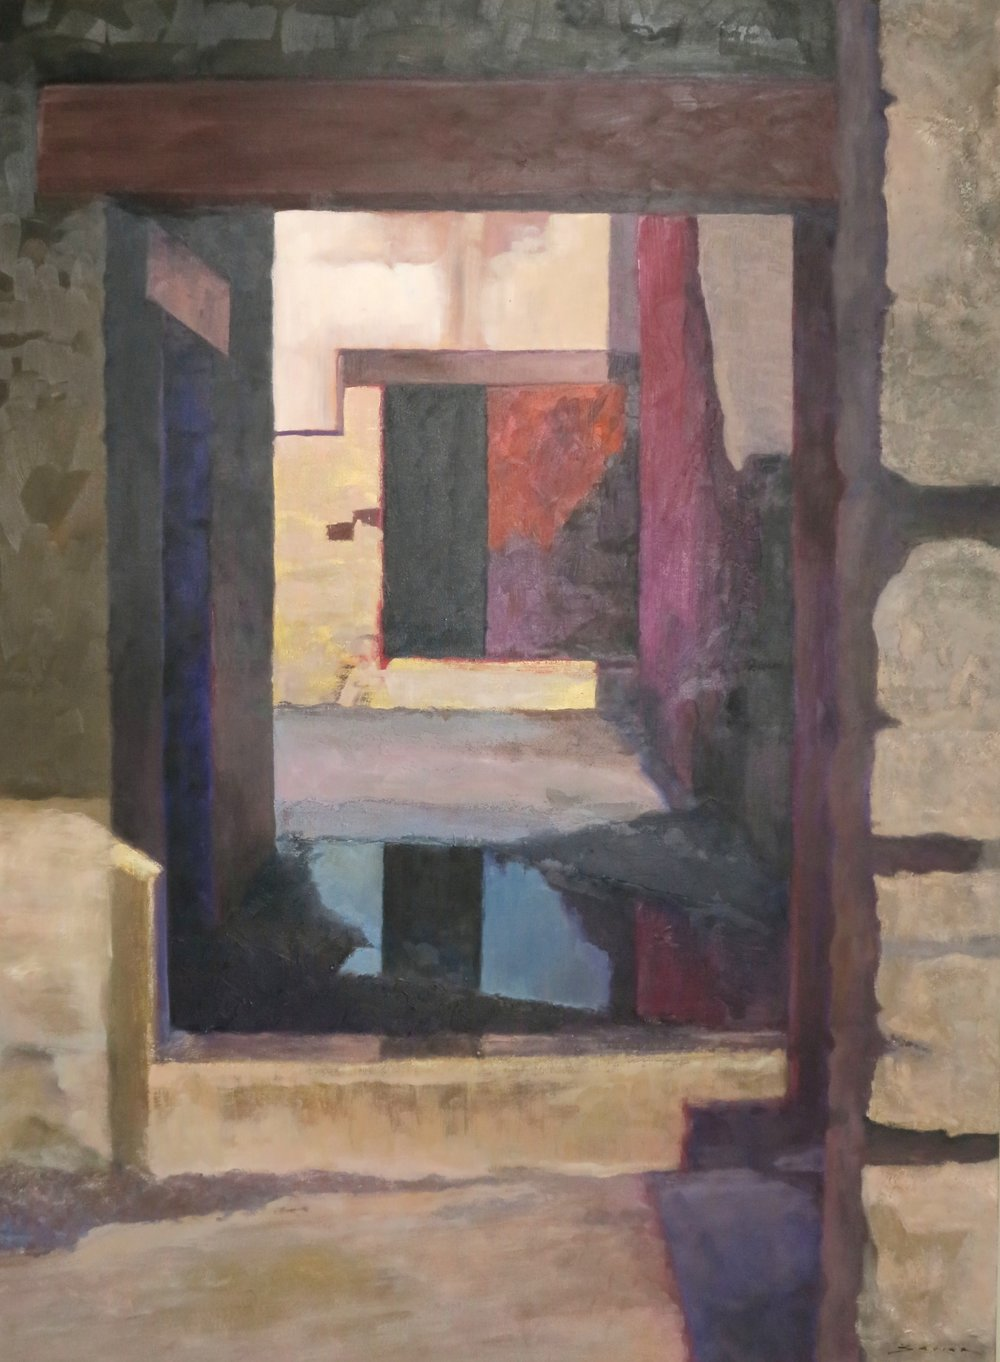 Herculaneum #2, 48 x 36, oil